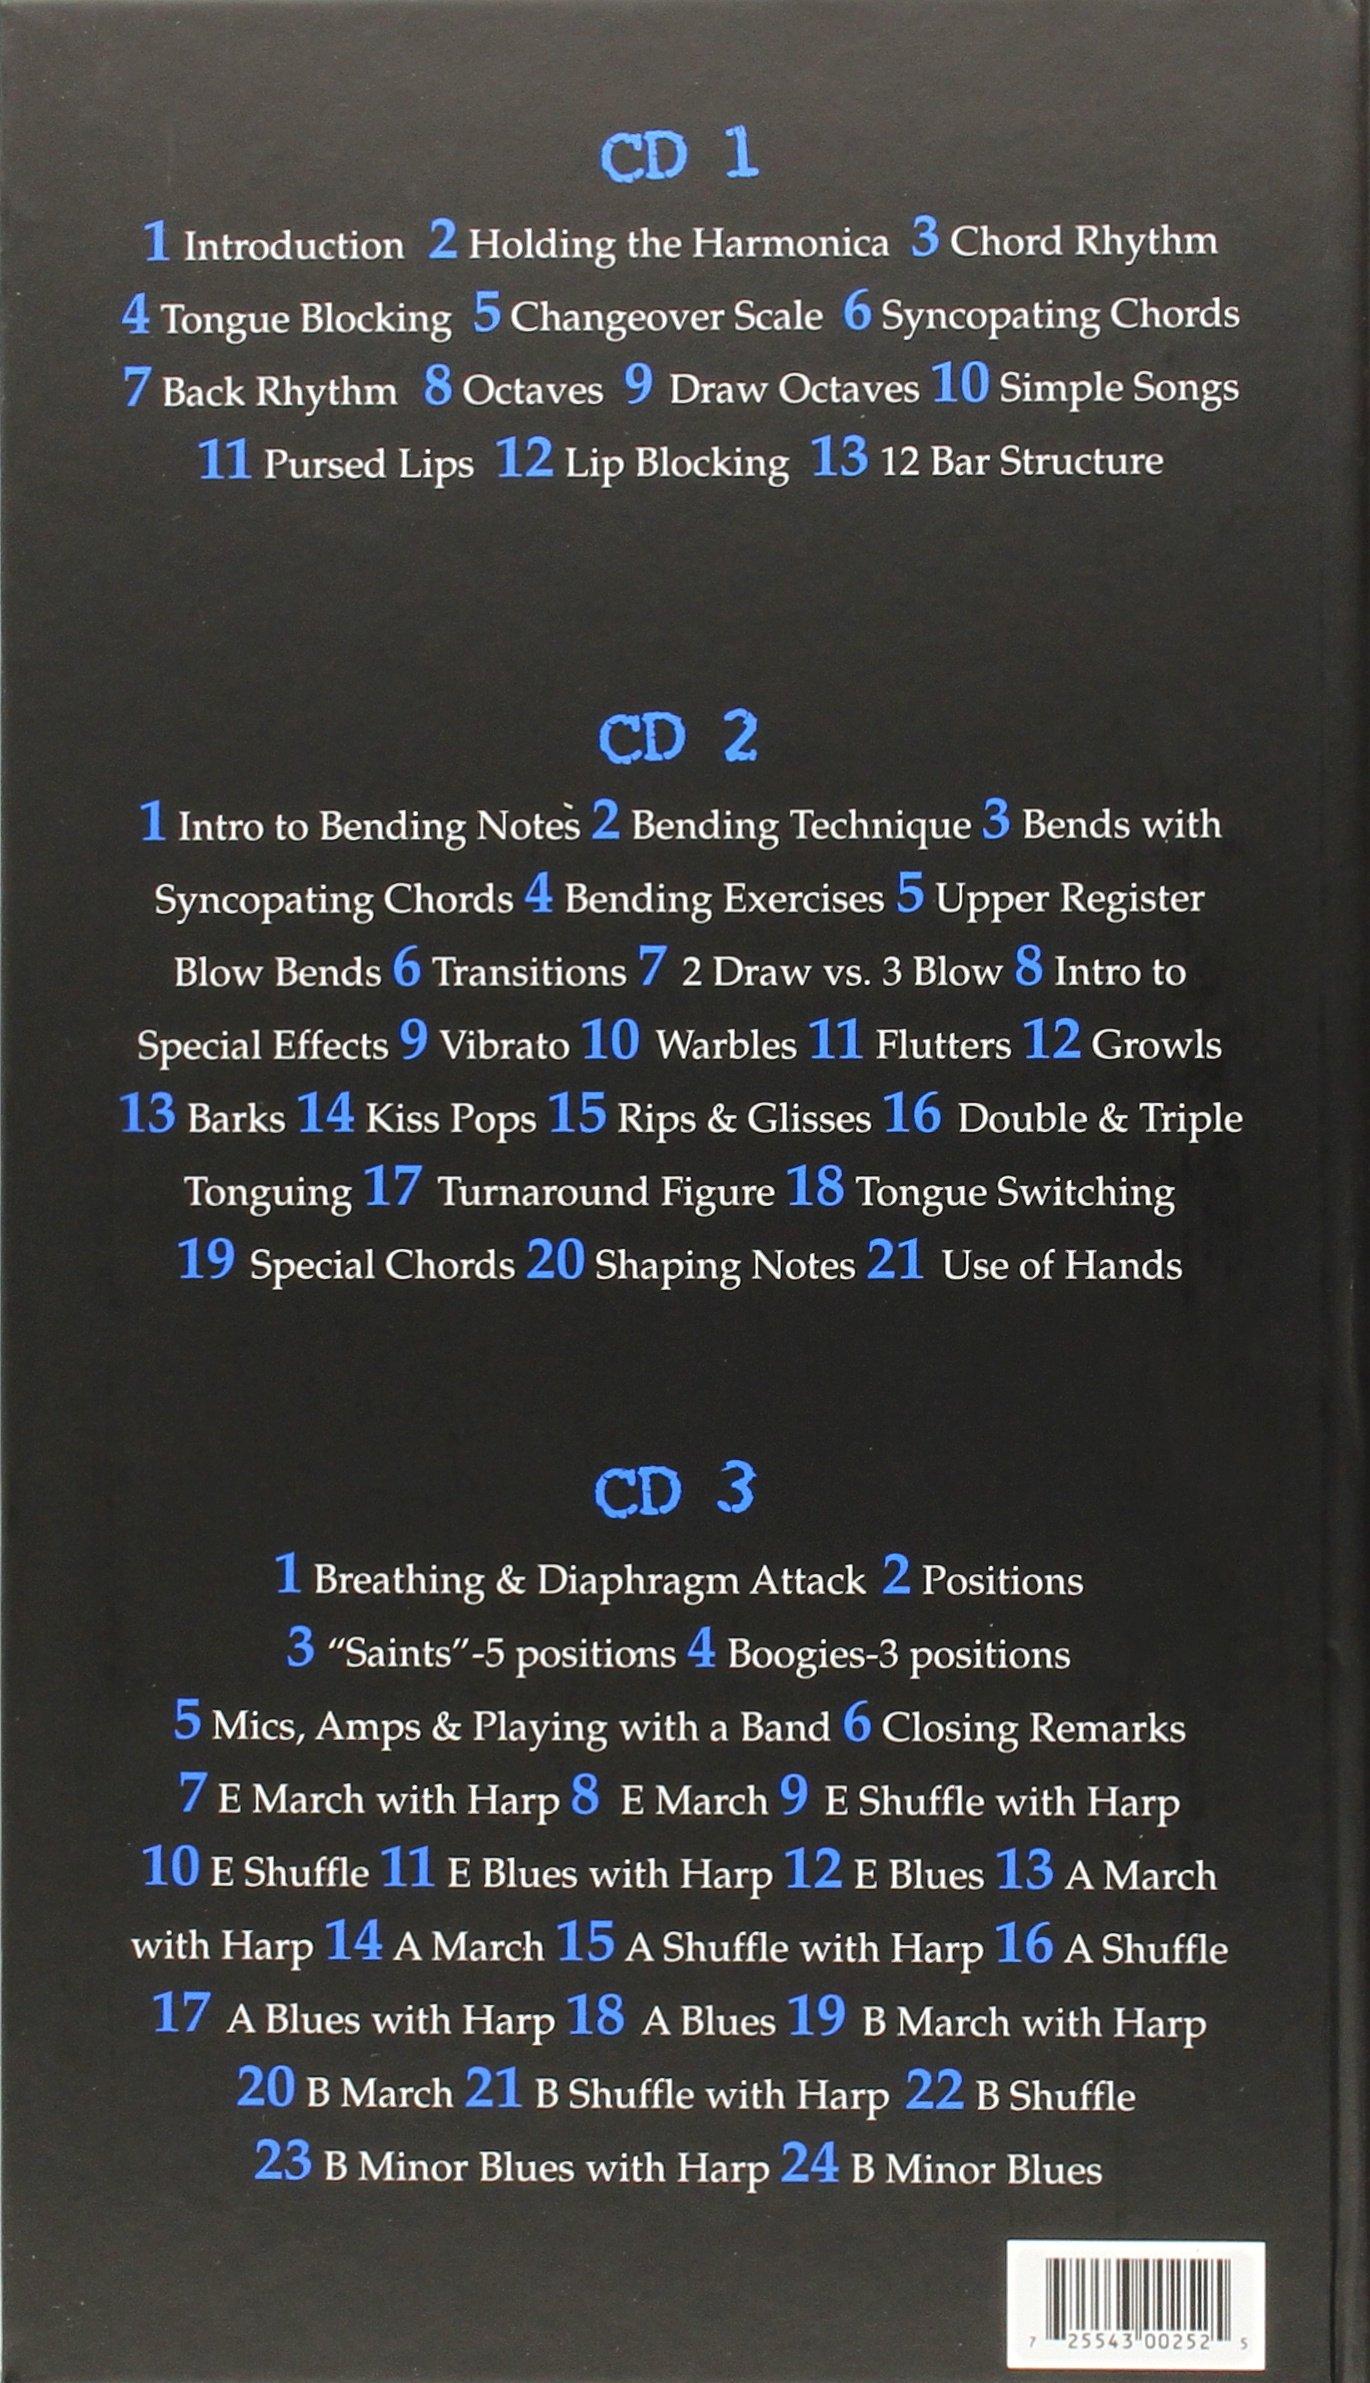 Jerry Portnoy's Blues Harmonica Masterclass by JAMY